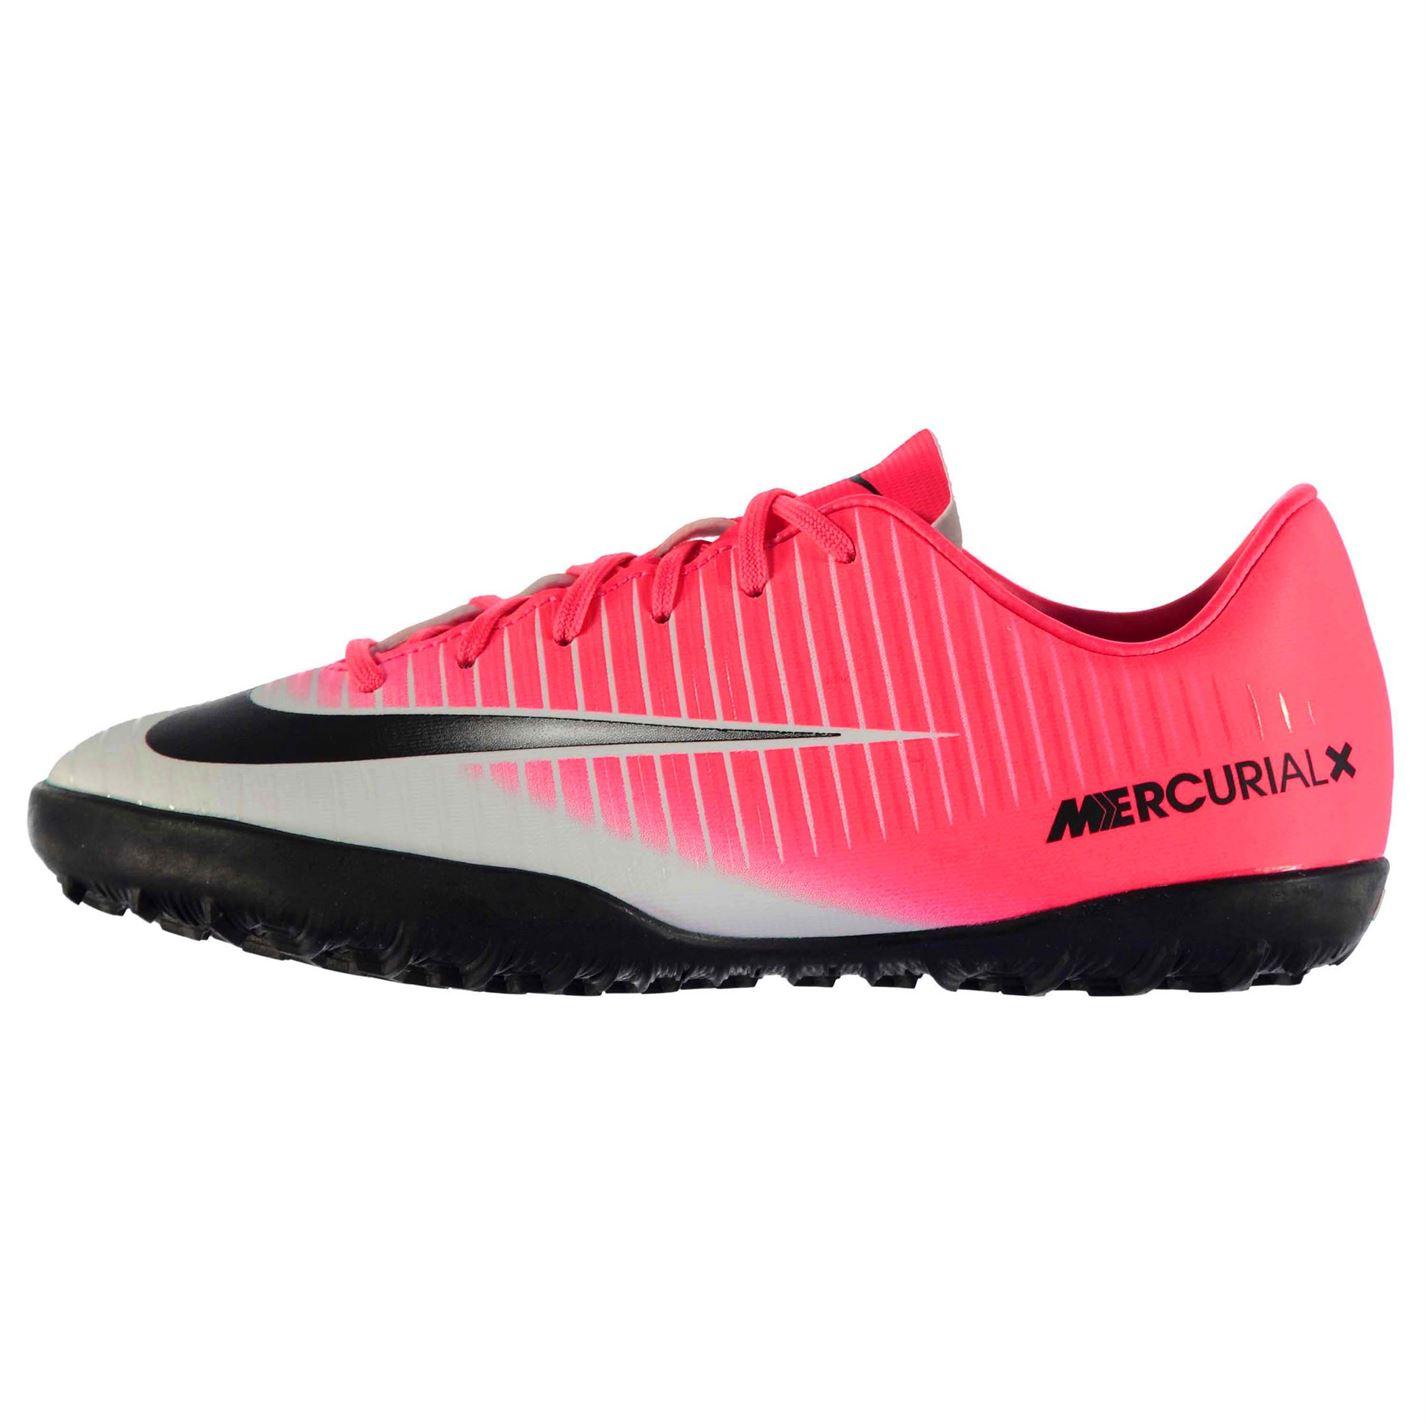 Nike Mercurial Victory VI Astro Turf Trainers Junior